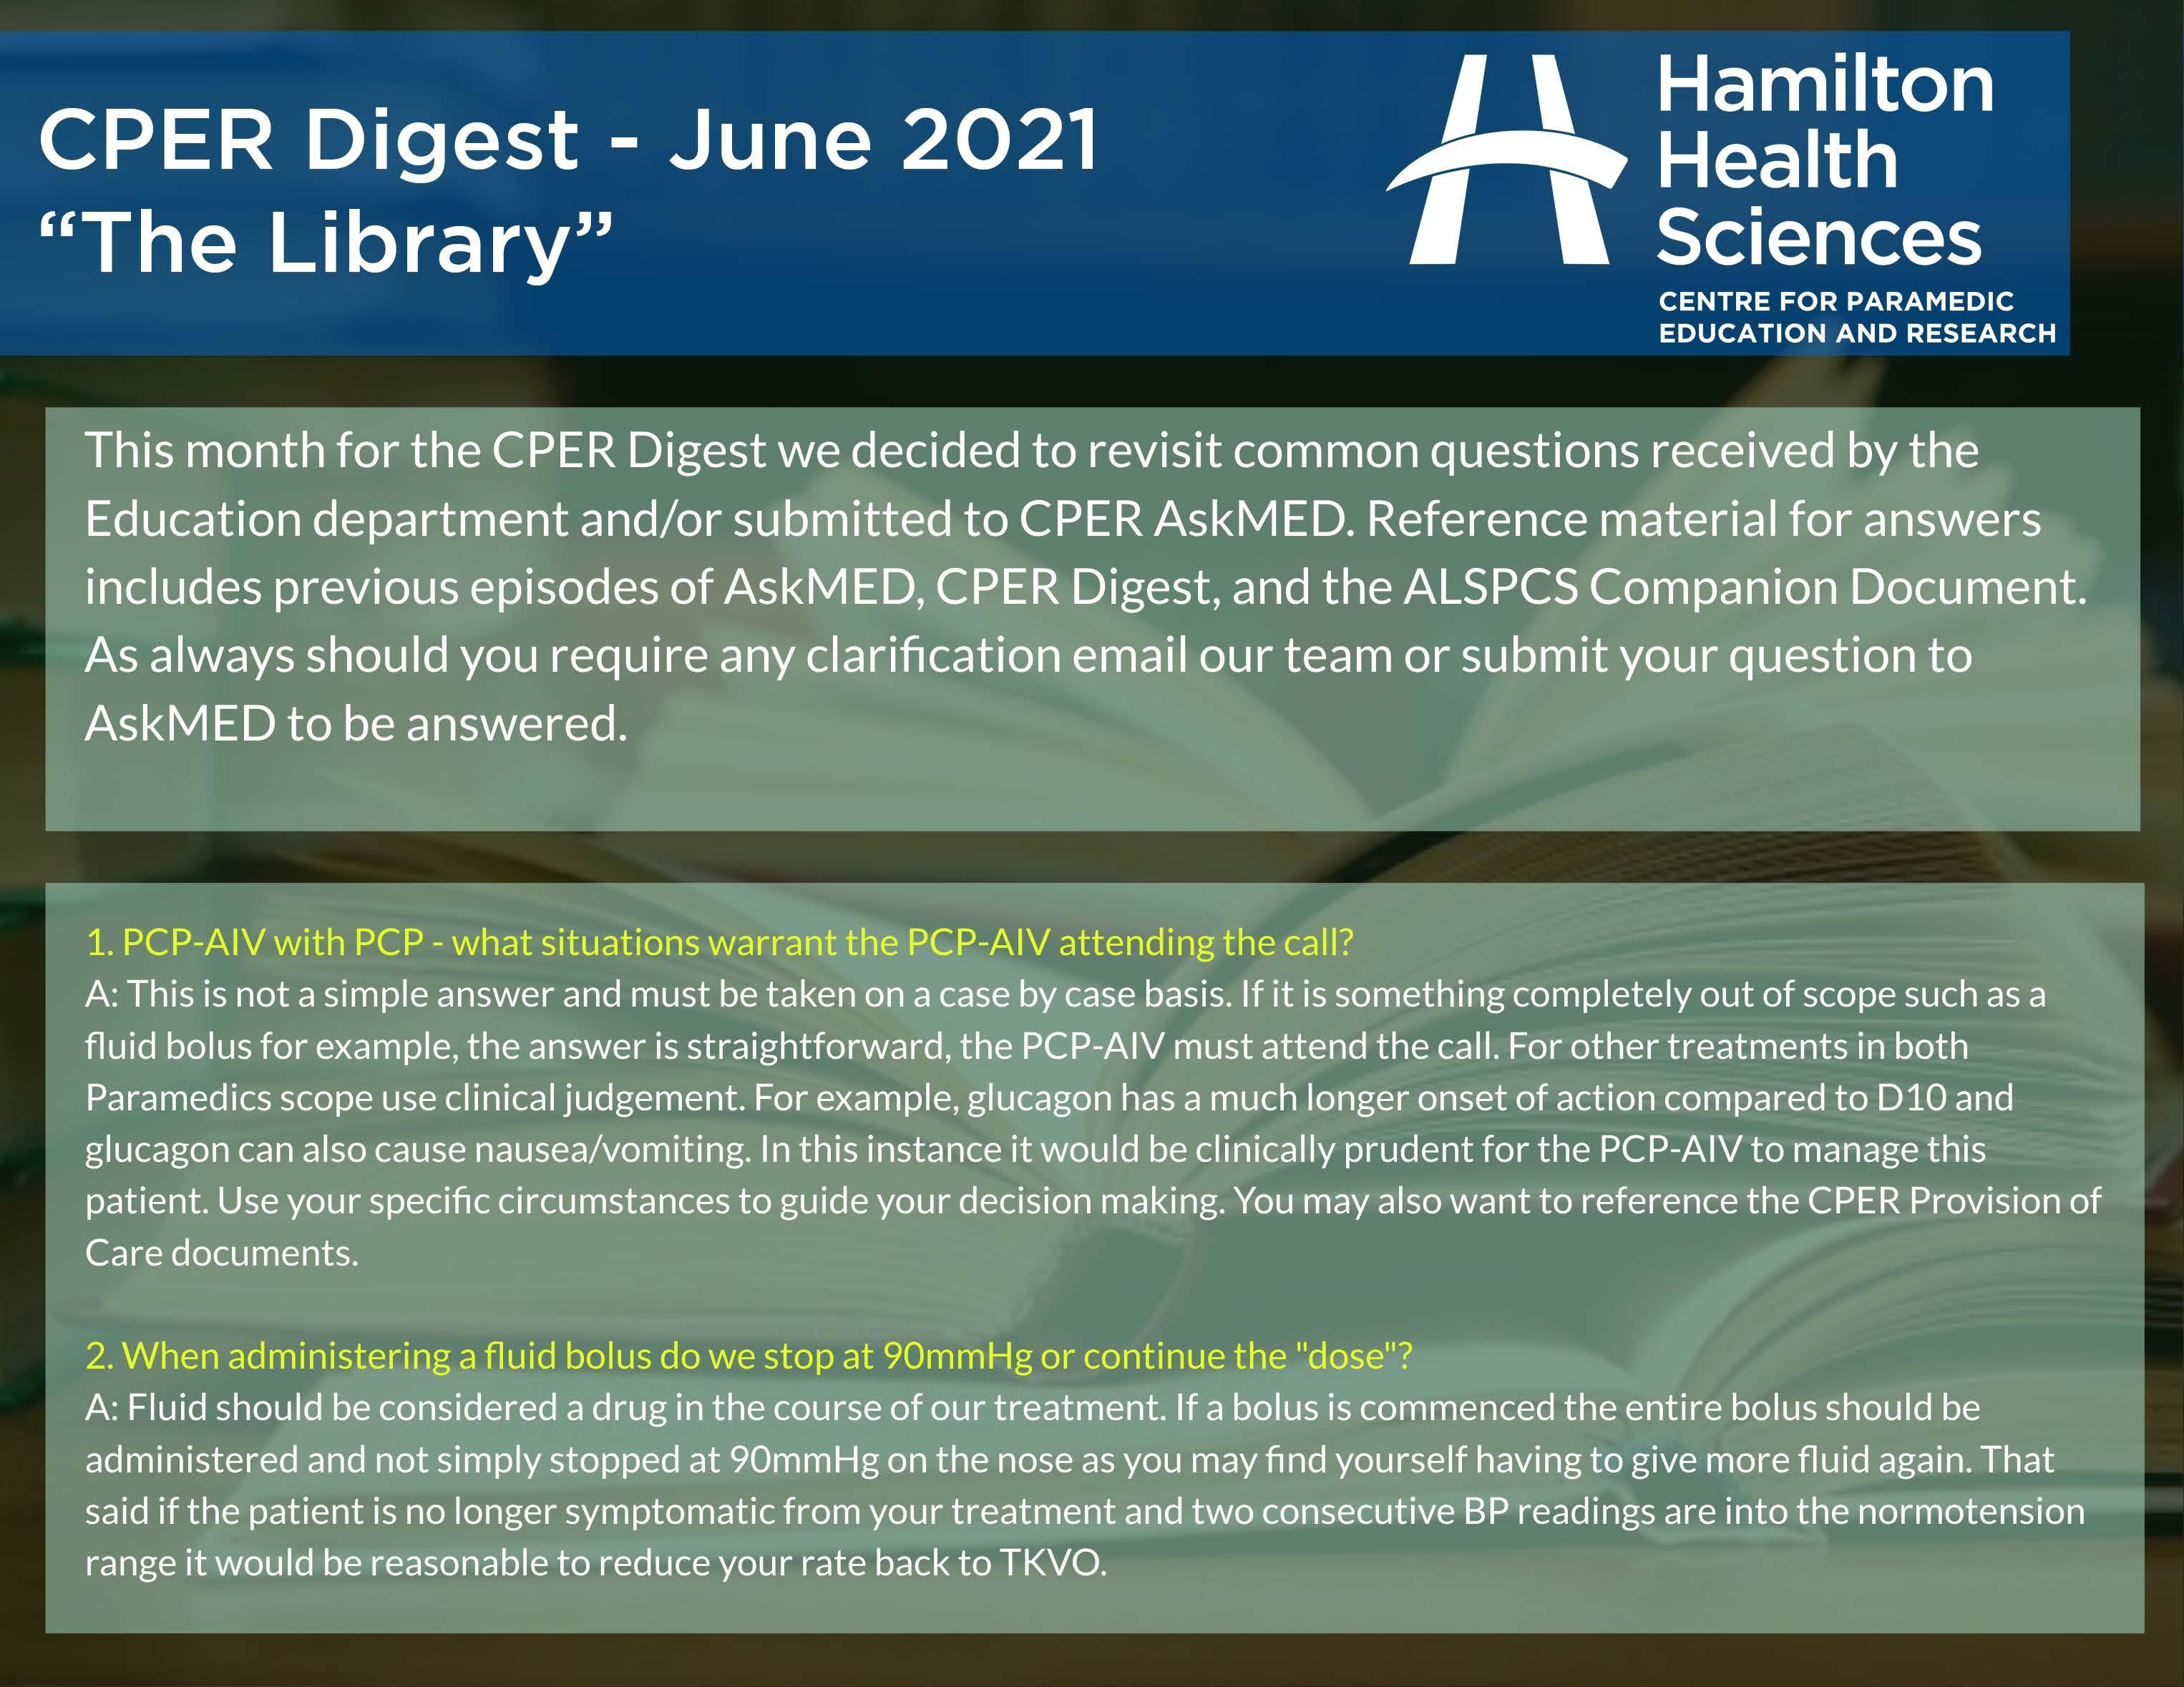 CPER Digest June 2021 FINAL Page 1